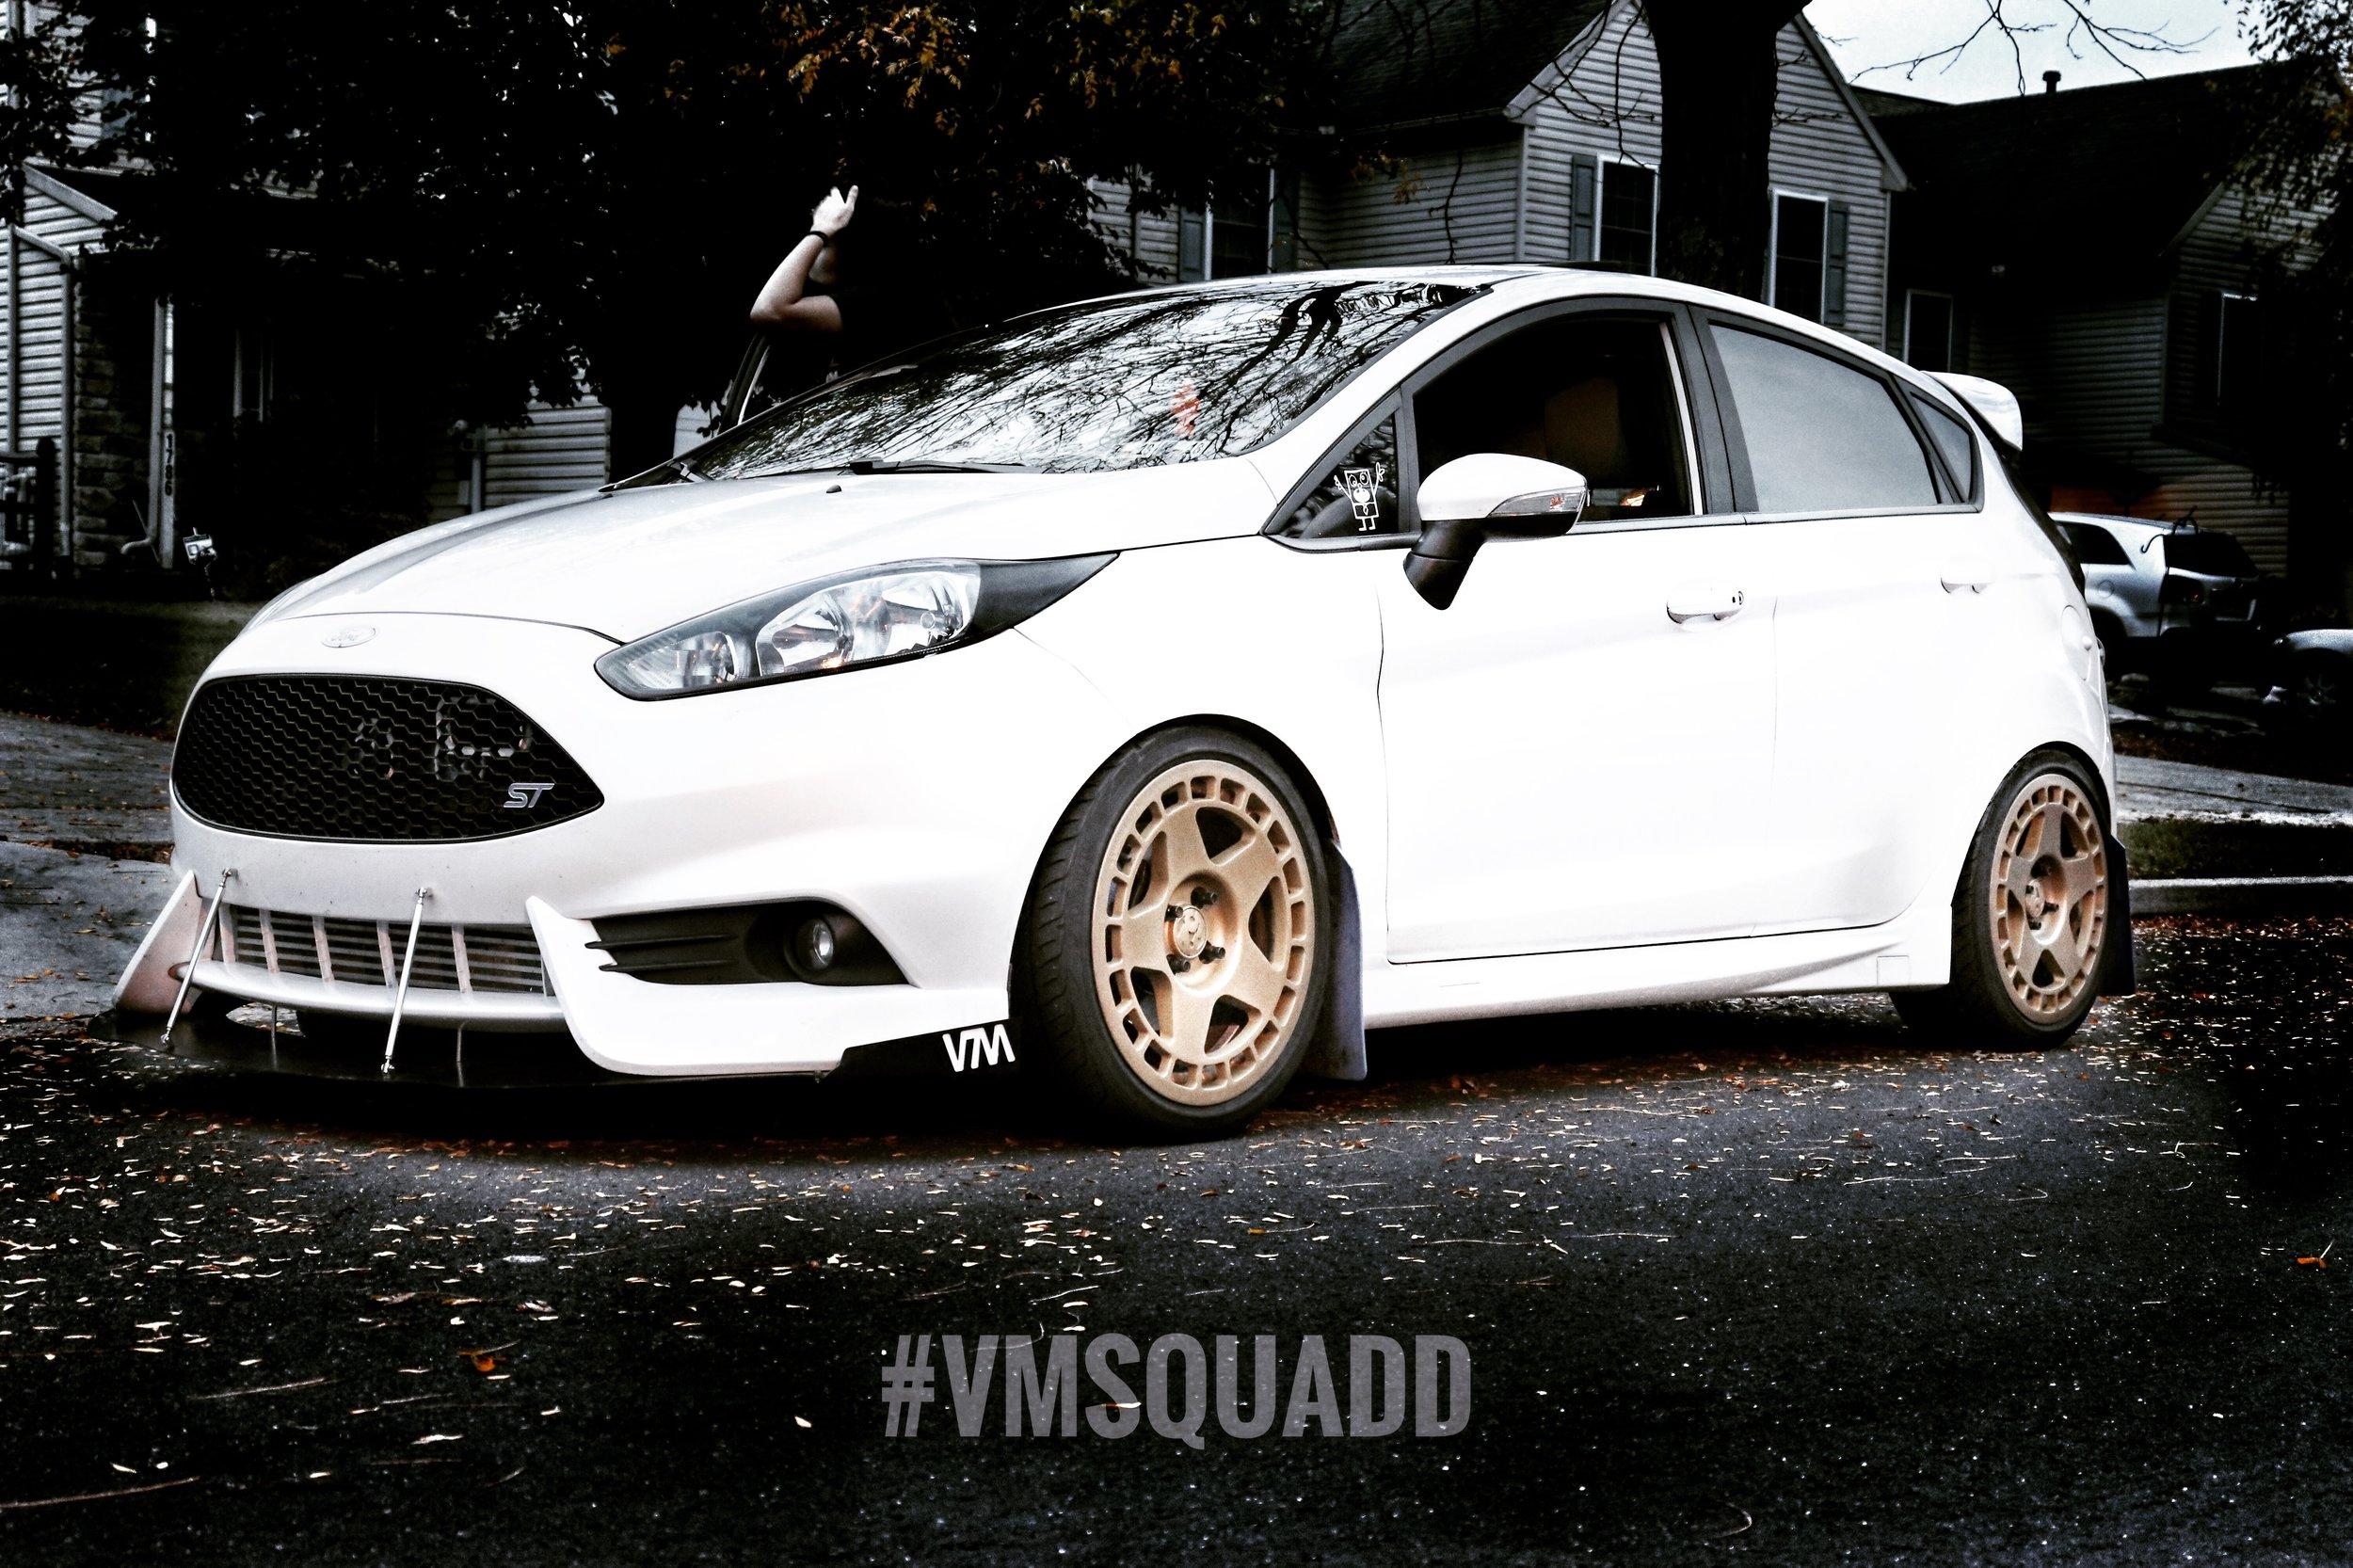 2016 Ford Fiesta ST - Owner: BradLocation: PennsylvaniaInstagram: bradward_fVega products installed:VM Aluminum Front Splitter with VM bolt-on side fins and VM cutout UNDER Fifteen52 cup spoilers, VM Sideskirts with VM finsMod List: X47 hybrid turbo, 3